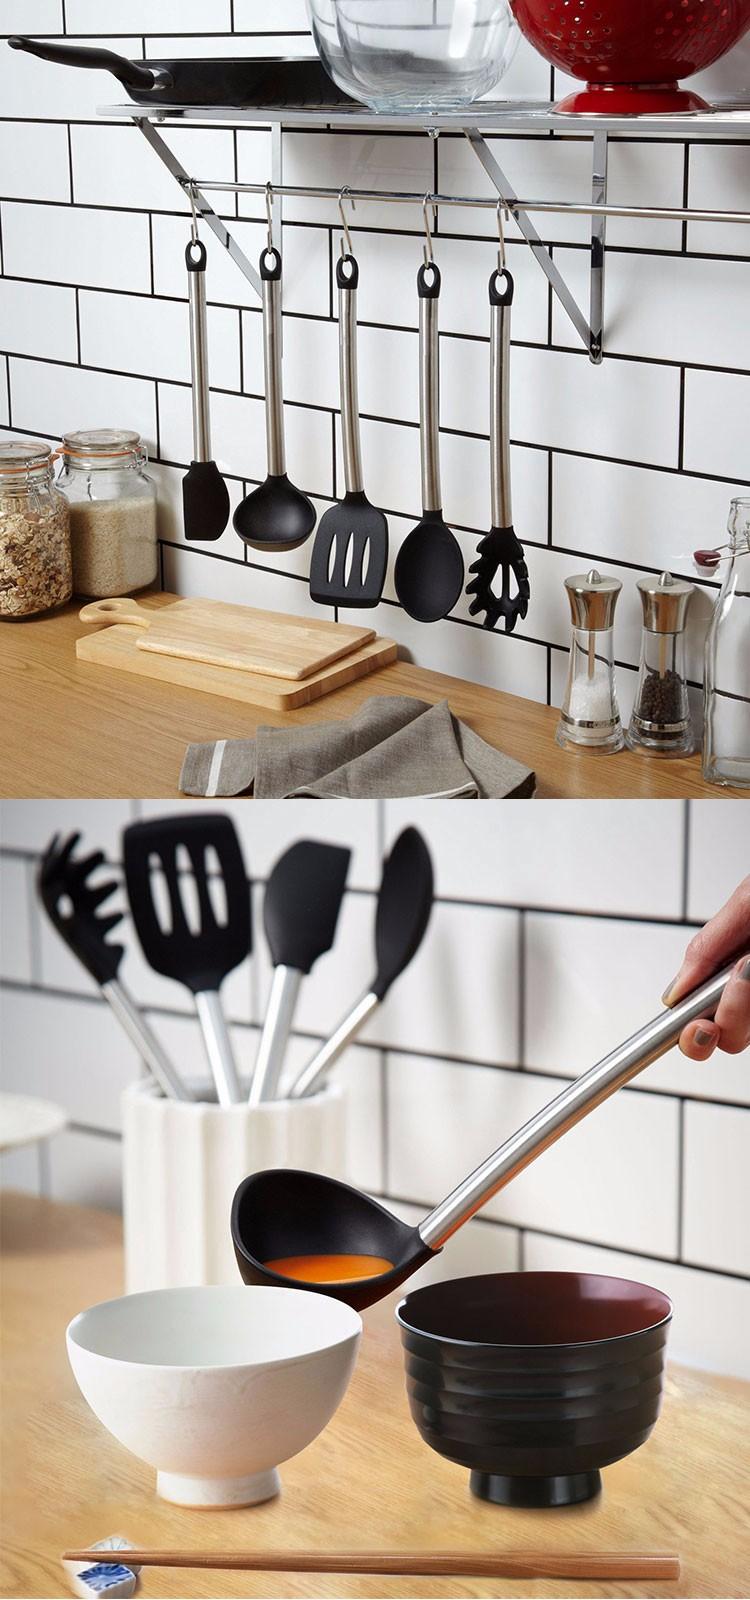 2016 mode color e silicone cuisine en vrac ustensiles ustensiles id de produit 1246554880 french for Ustensiles de cuisine belgique